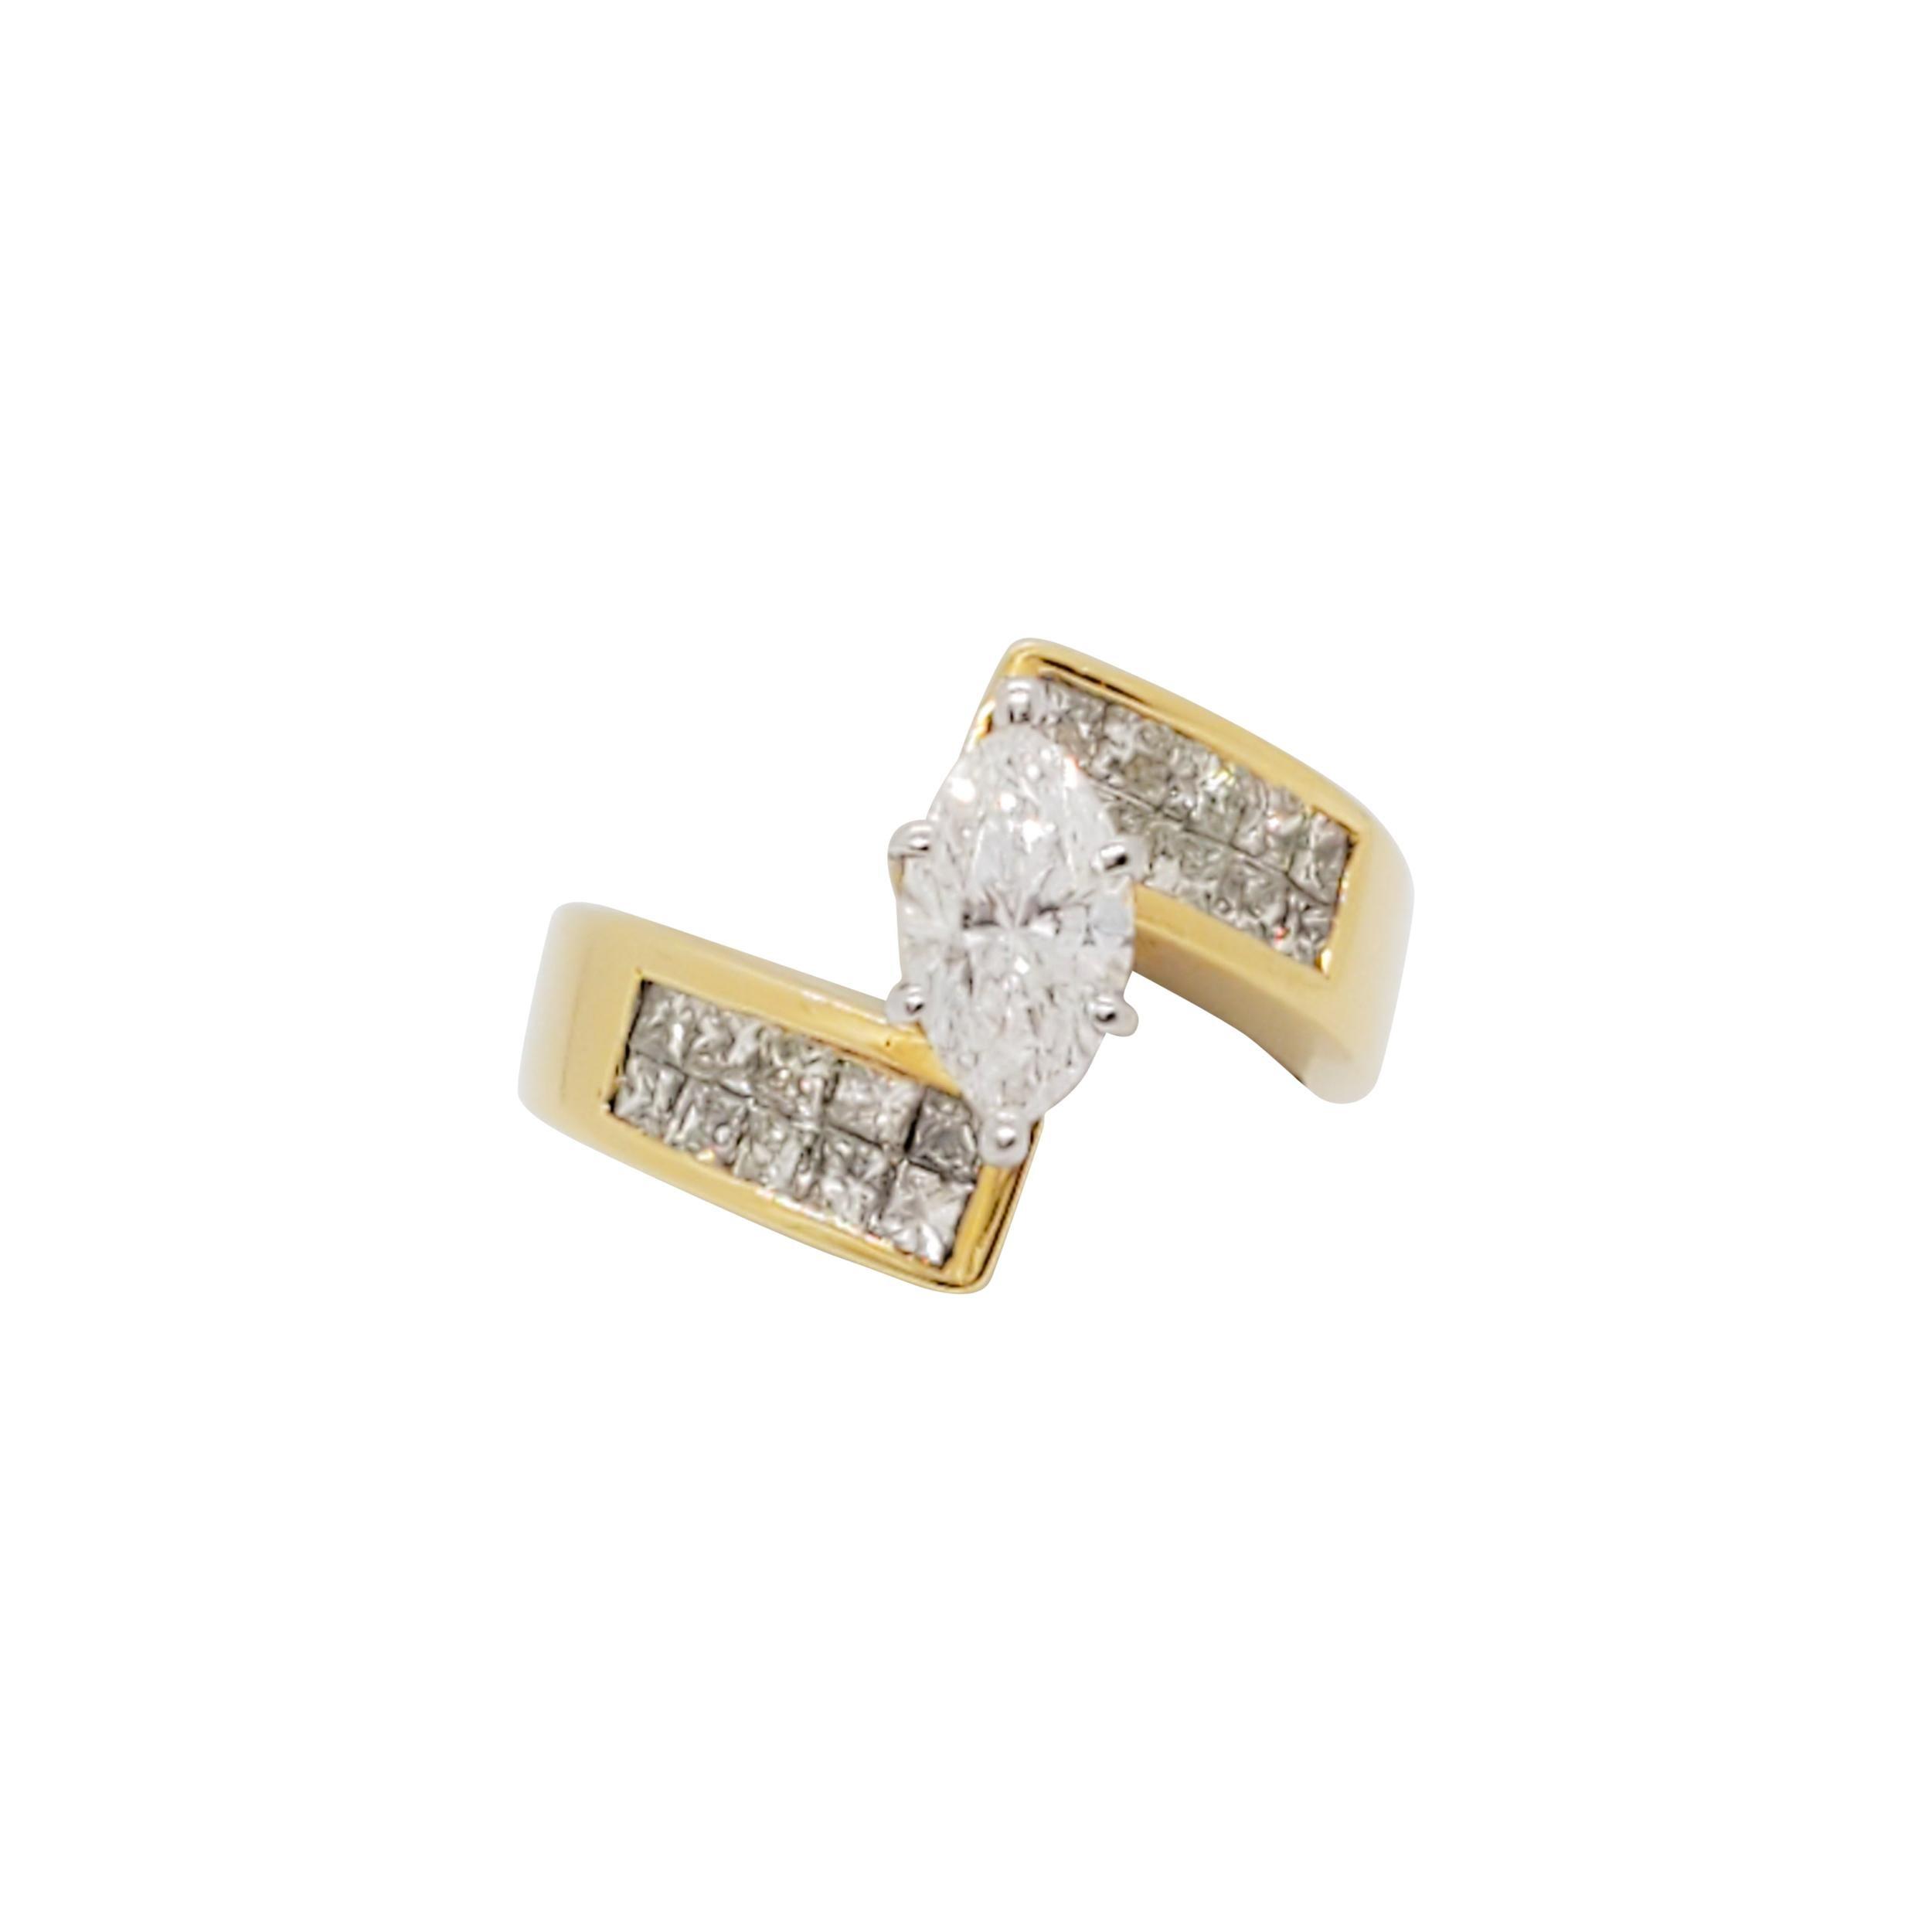 Estate White Diamond Marquise Fashion Ring in 18k Yellow Gold